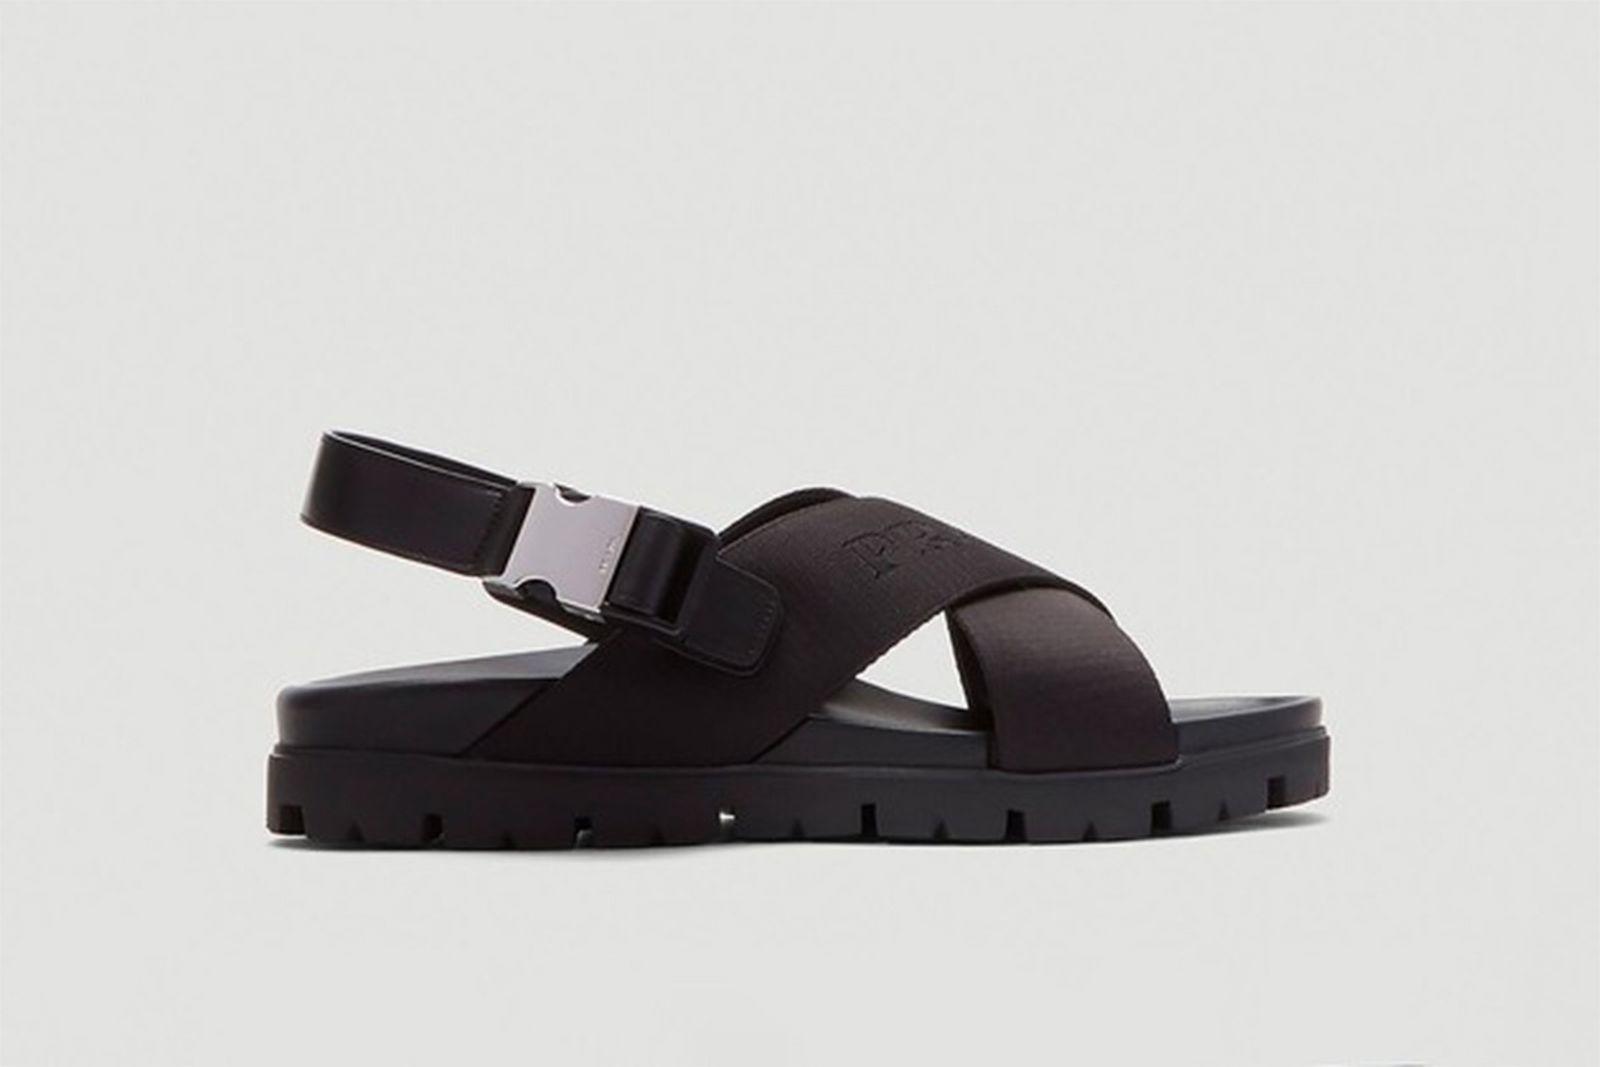 Prada-sandals-head1